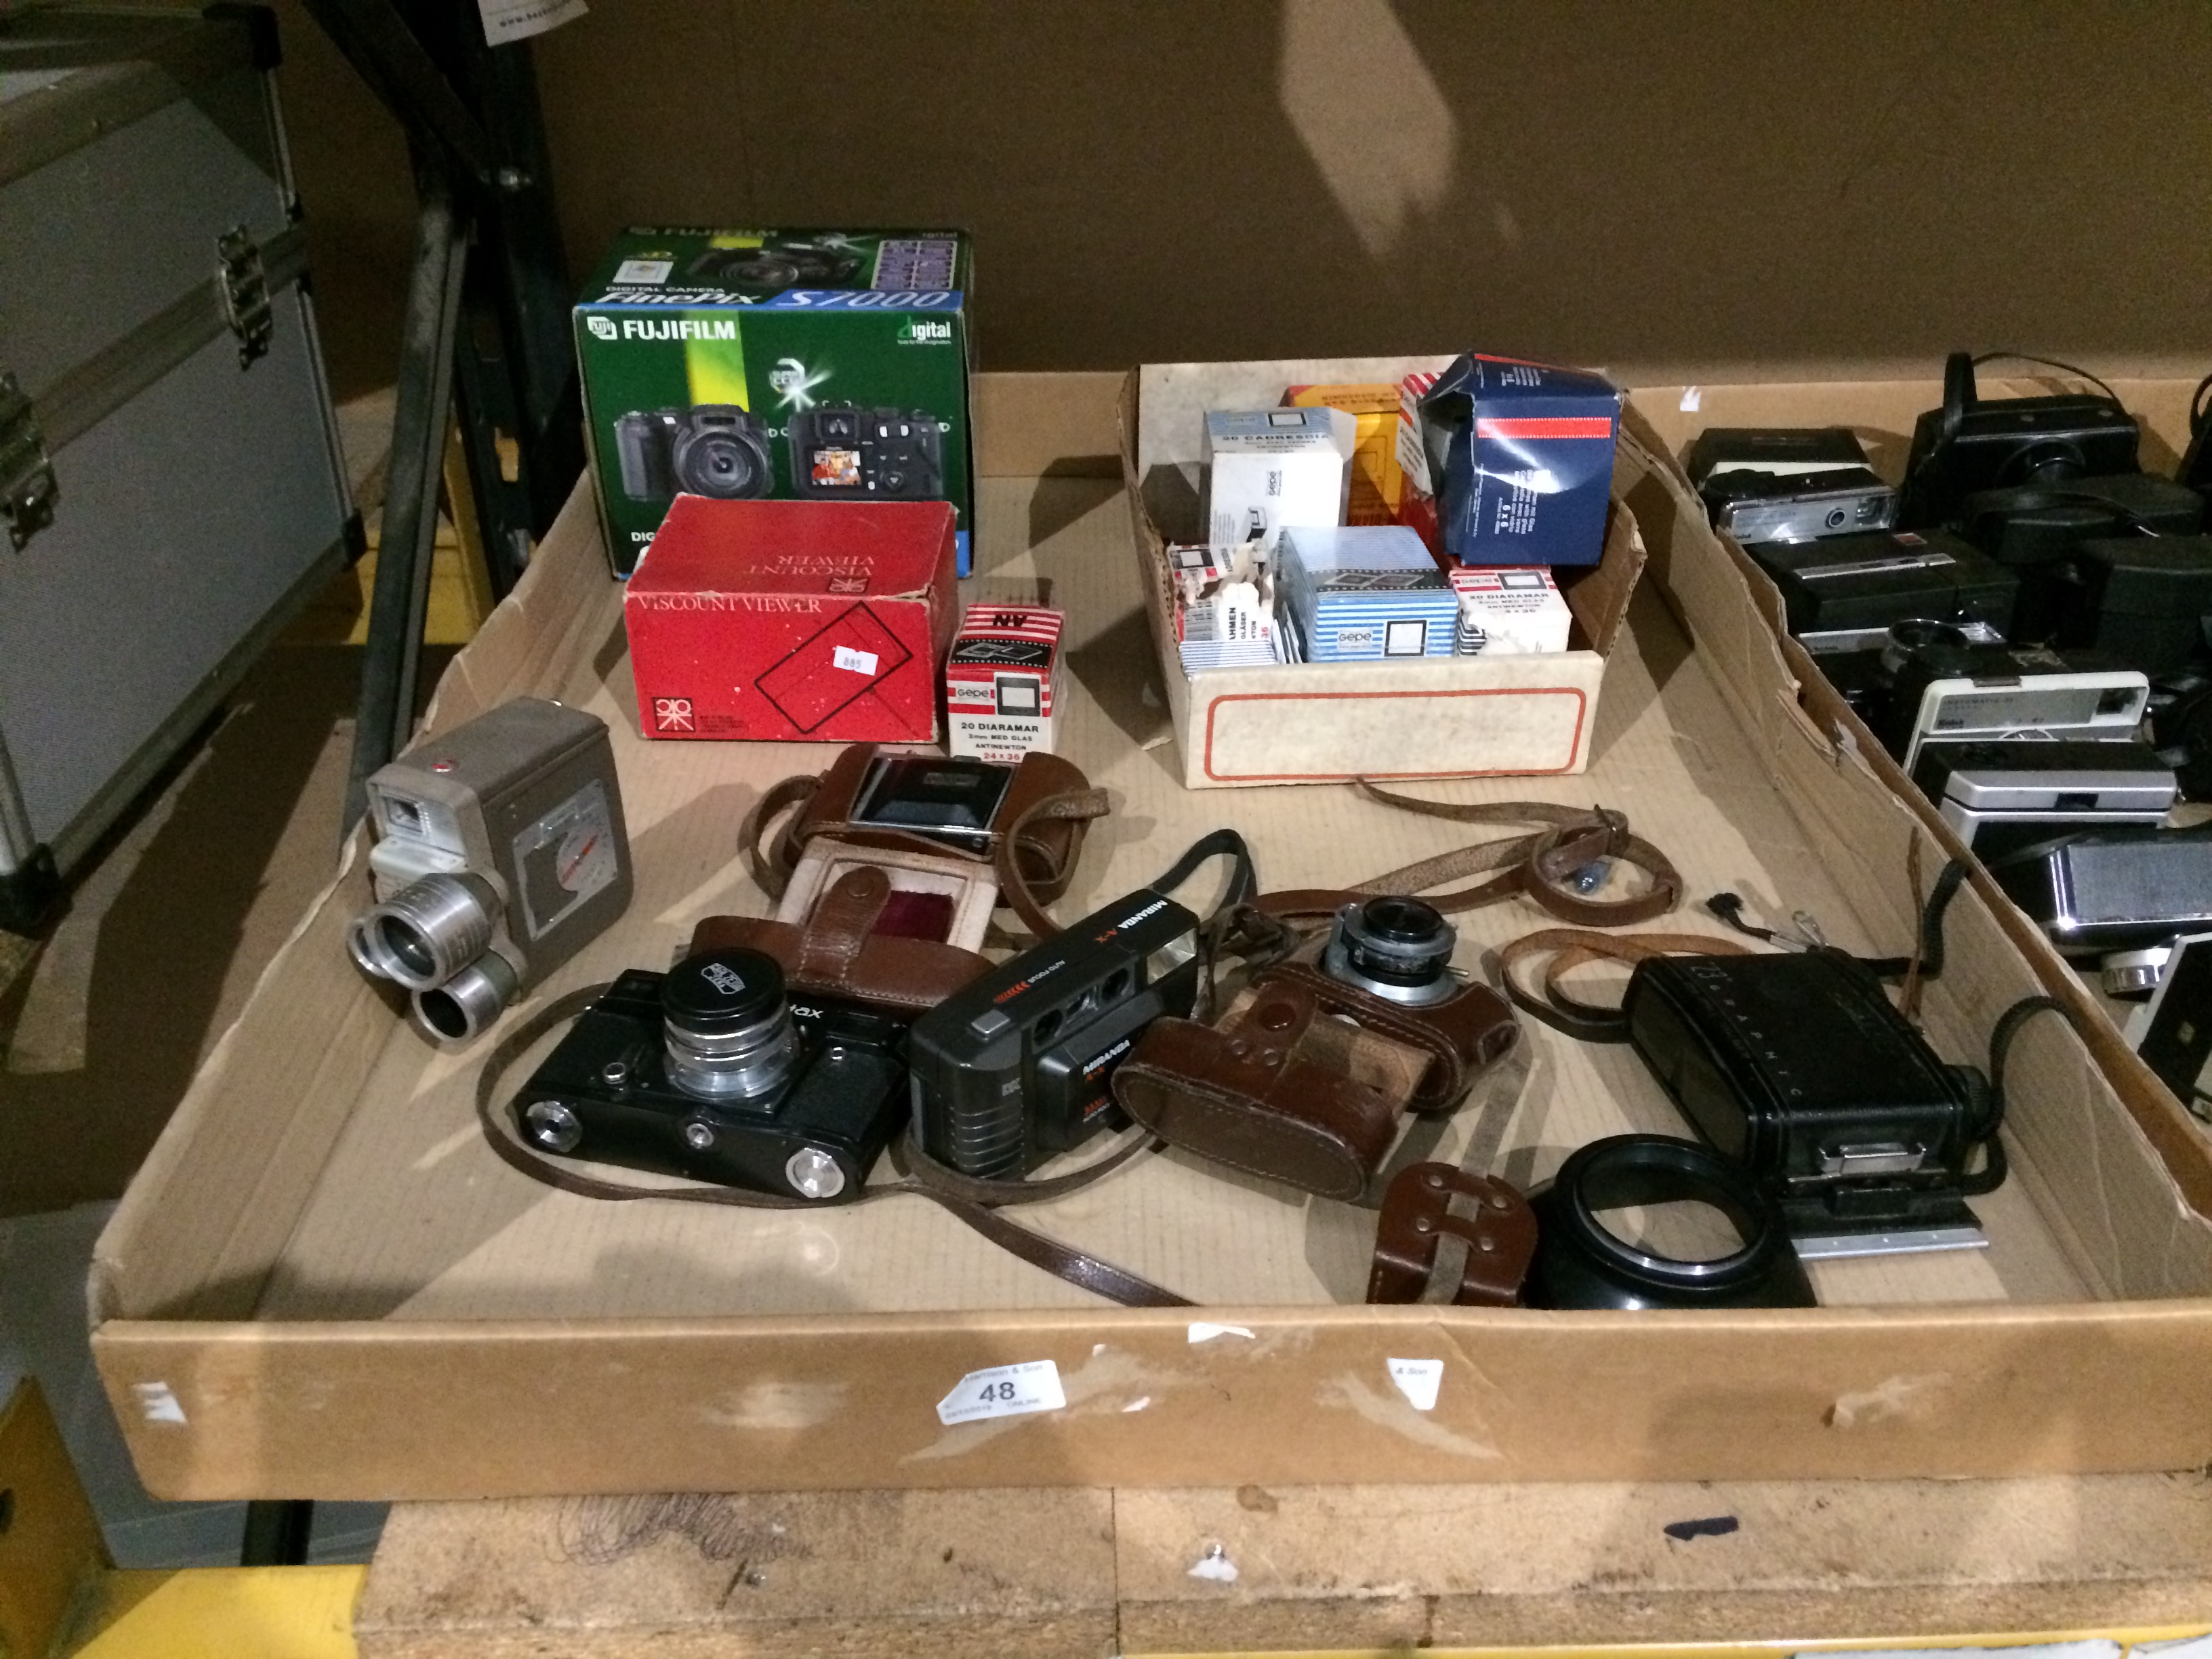 Lot 48 - Contents to tray - Contax camera, Medallion 8 film camera, Photavit Phutavit camera,